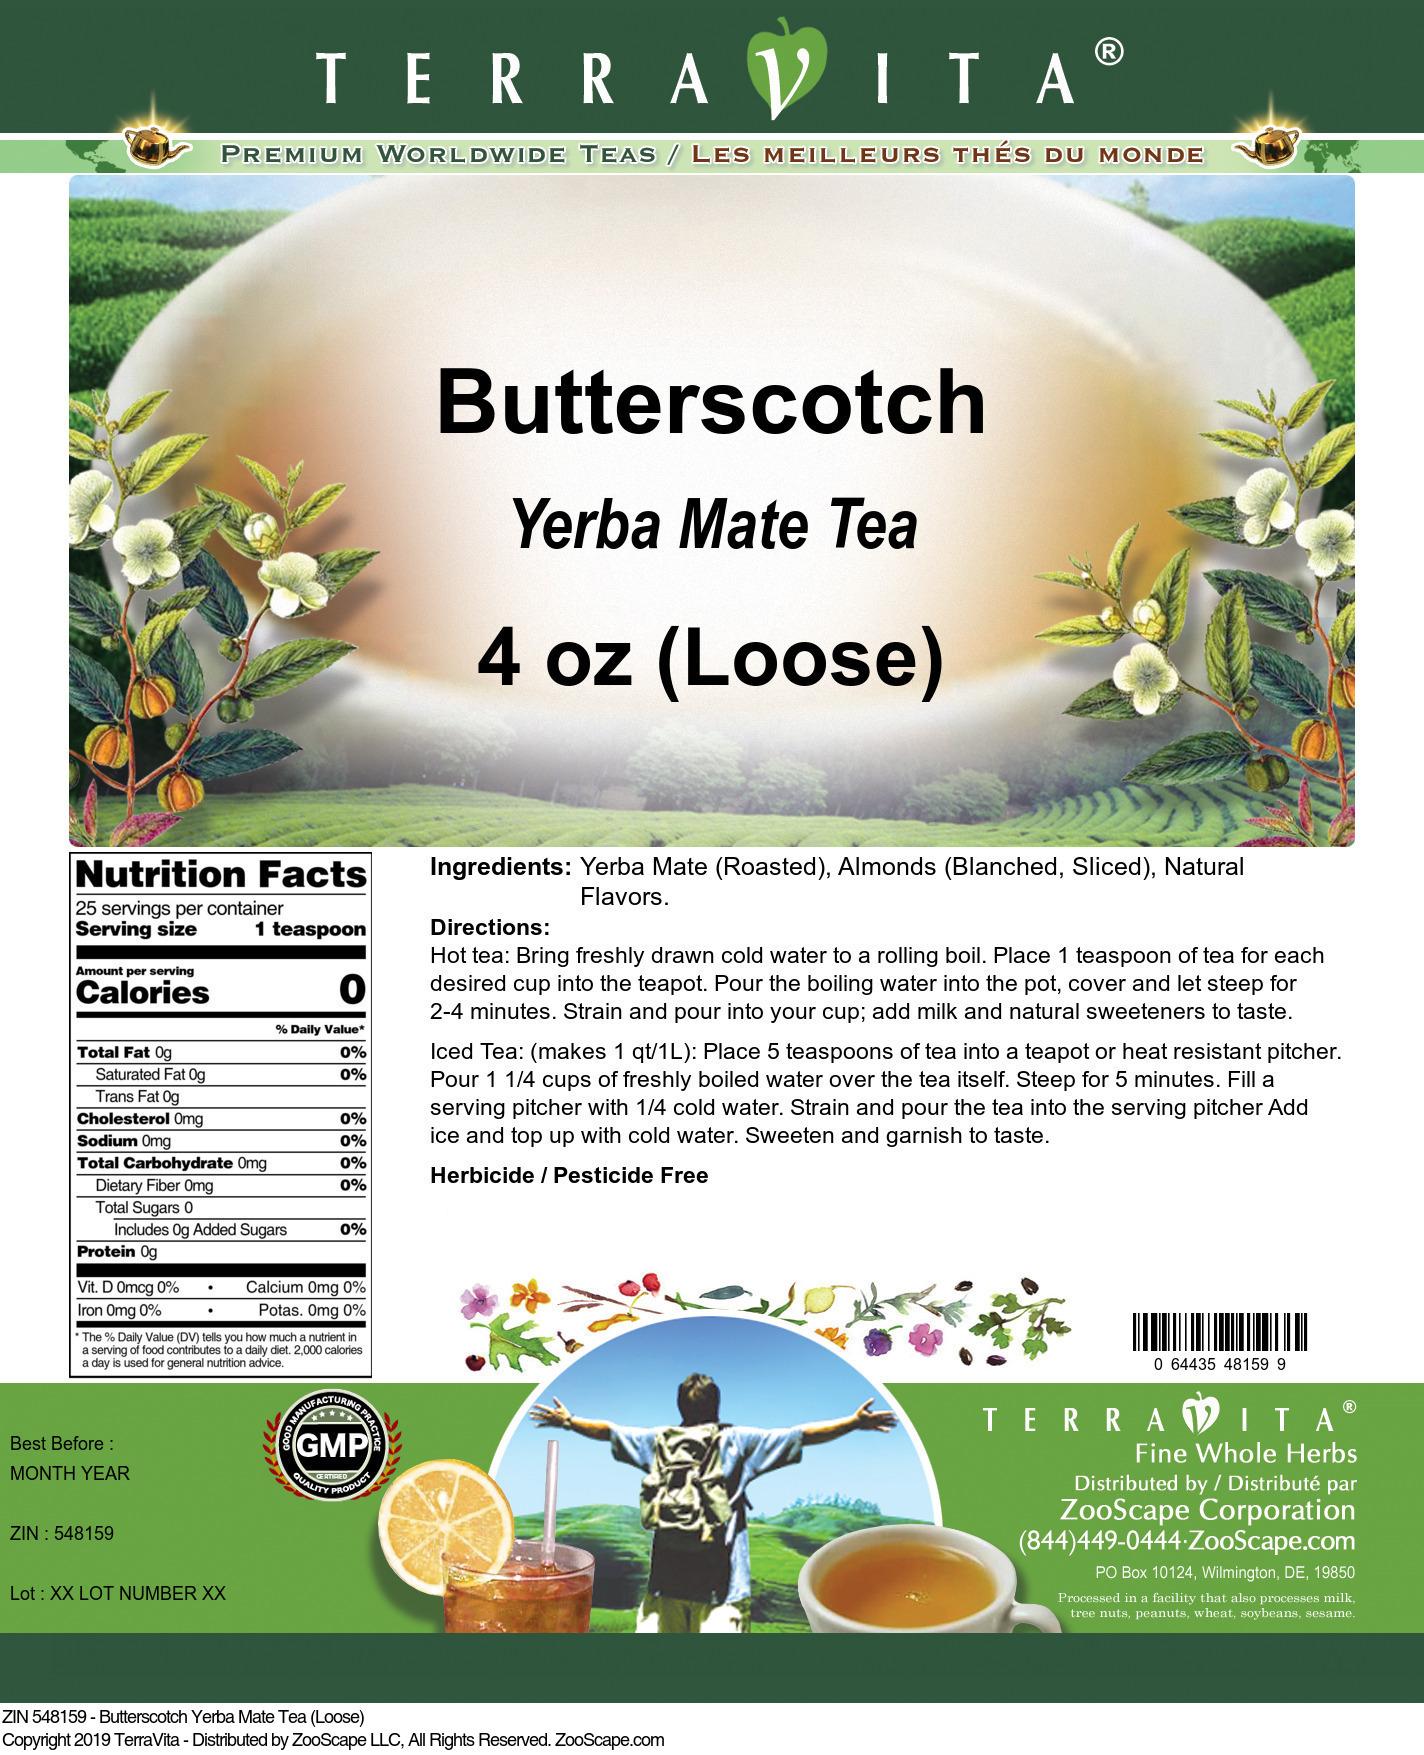 Butterscotch Yerba Mate Tea (Loose)